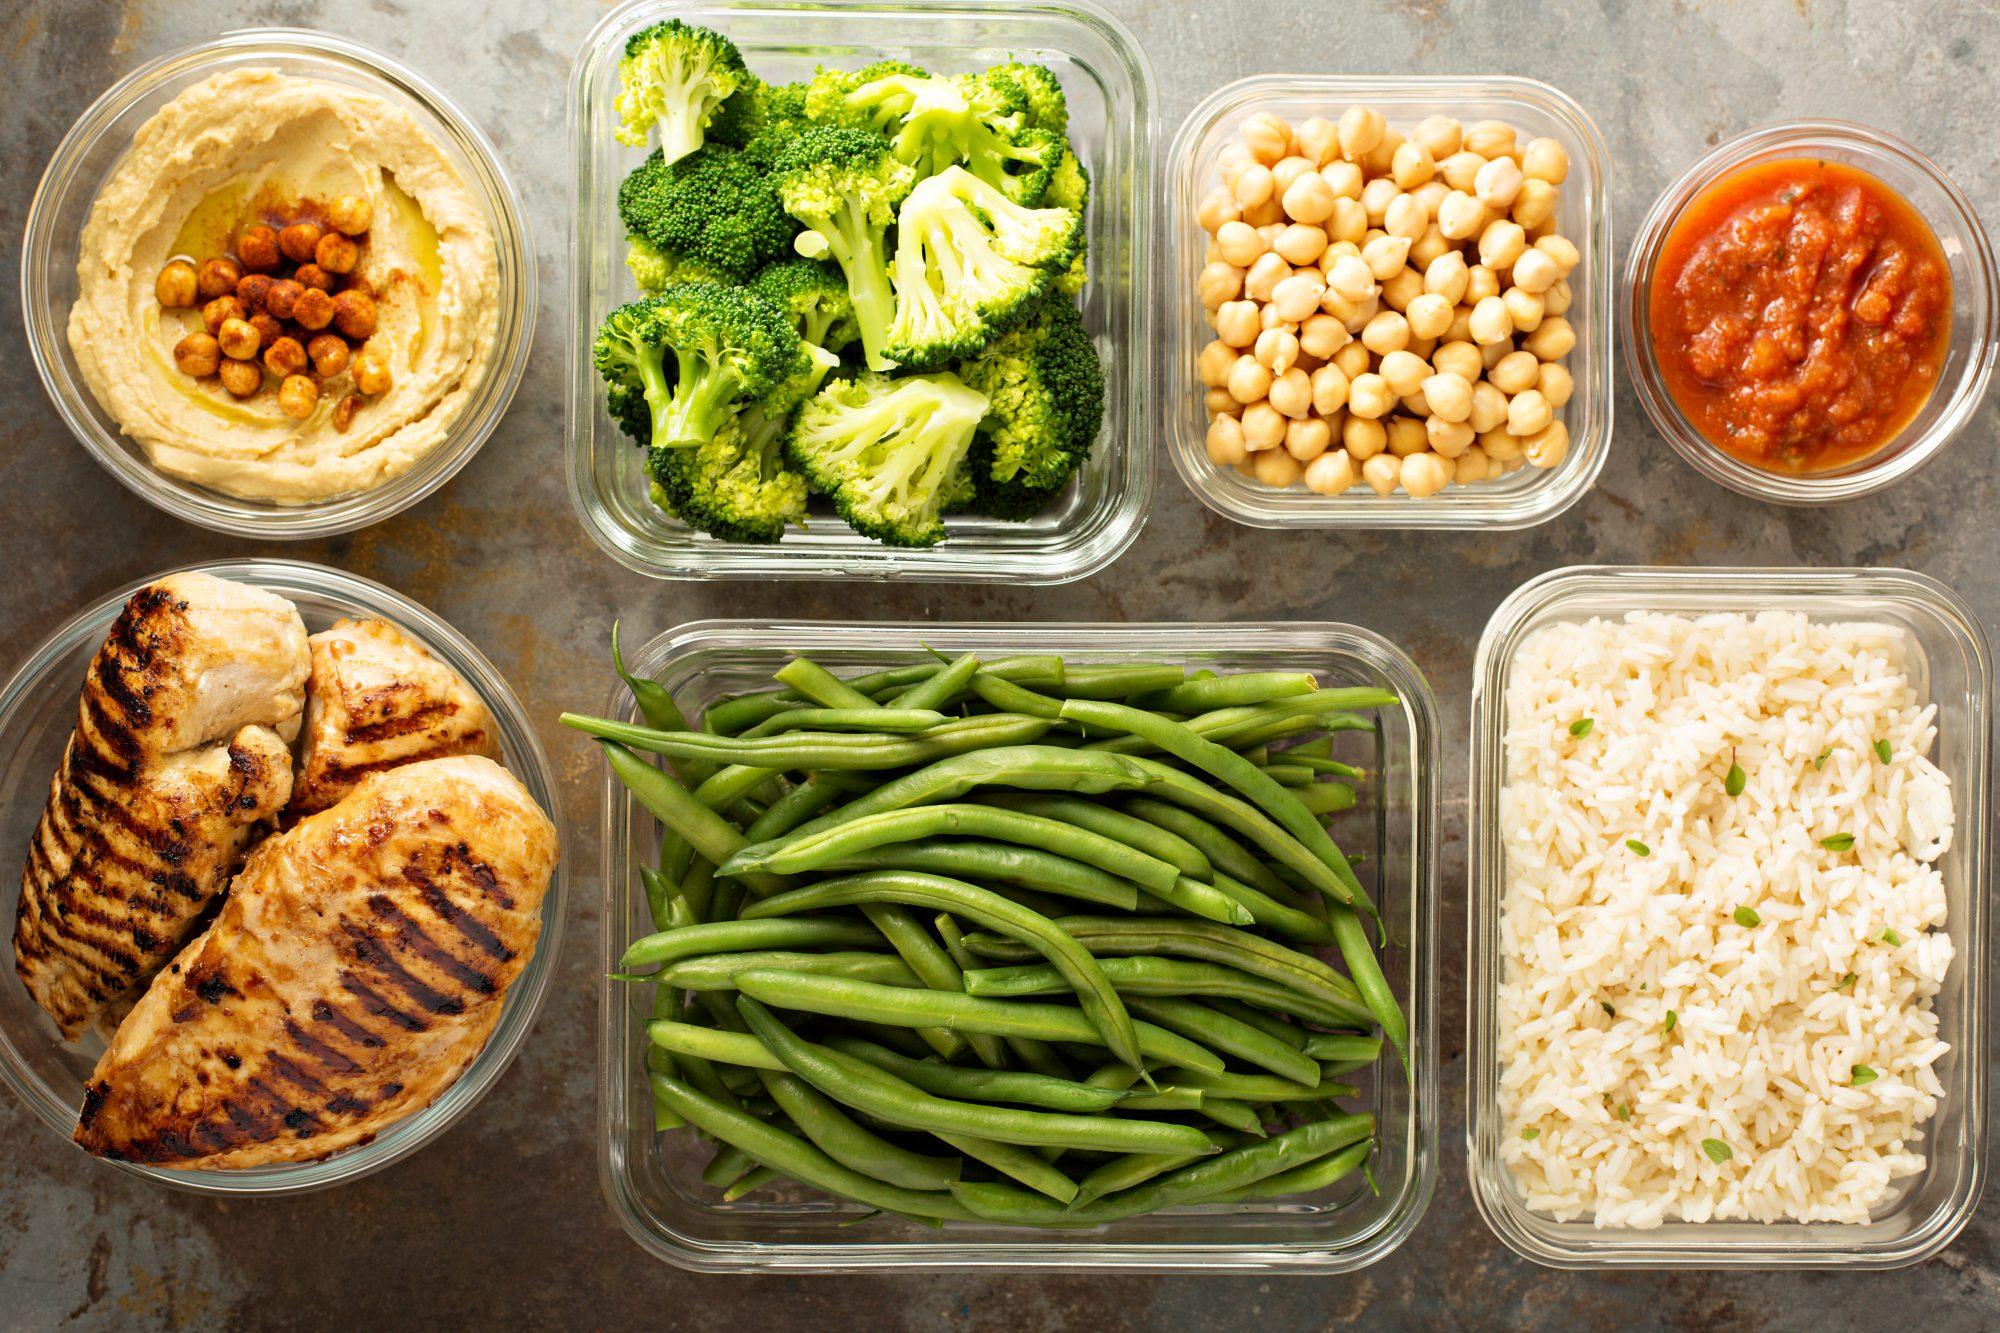 Top10 Best Diet Plan Apps To Lose Weight. 1